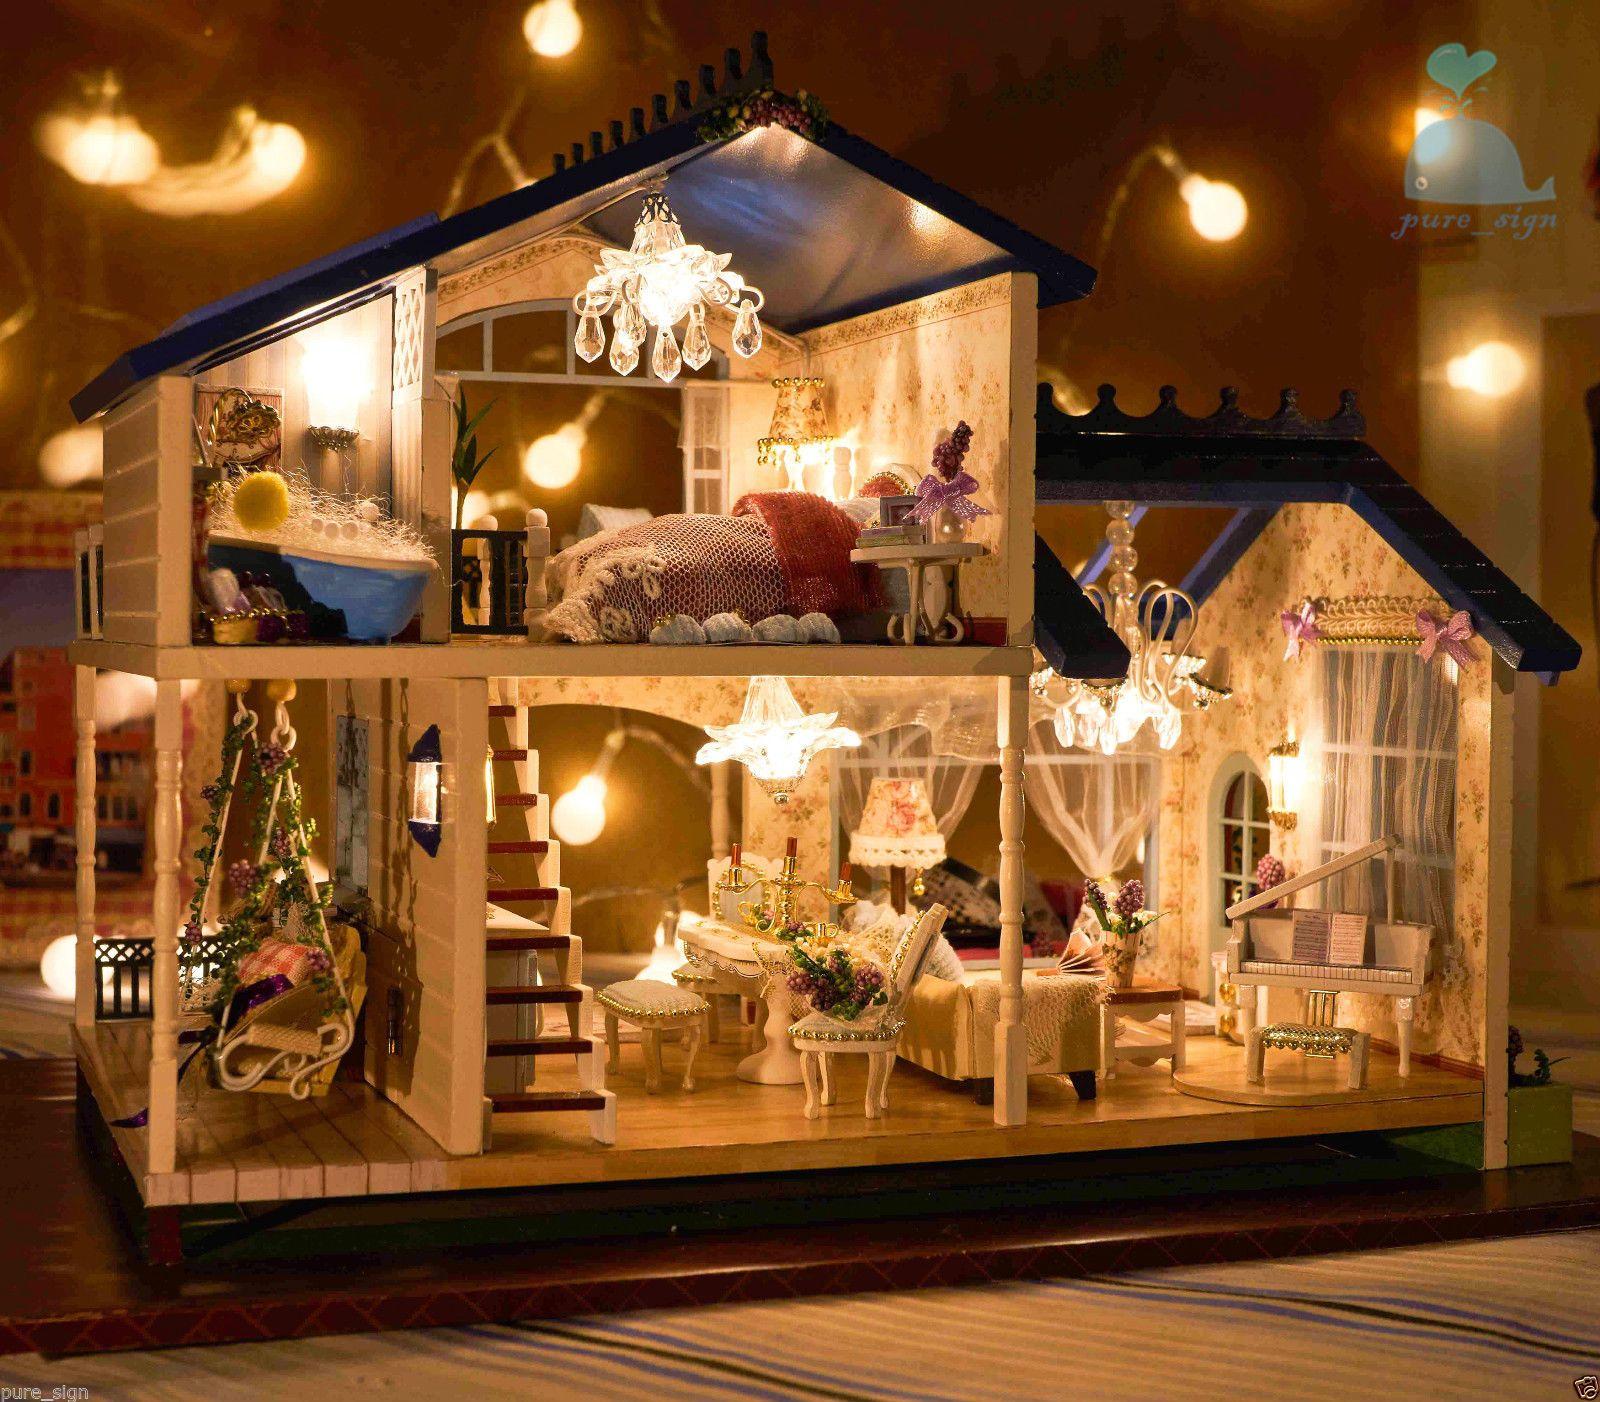 Diy handcraft miniature project dolls house my provence for Casa mendoza muebles villa martelli